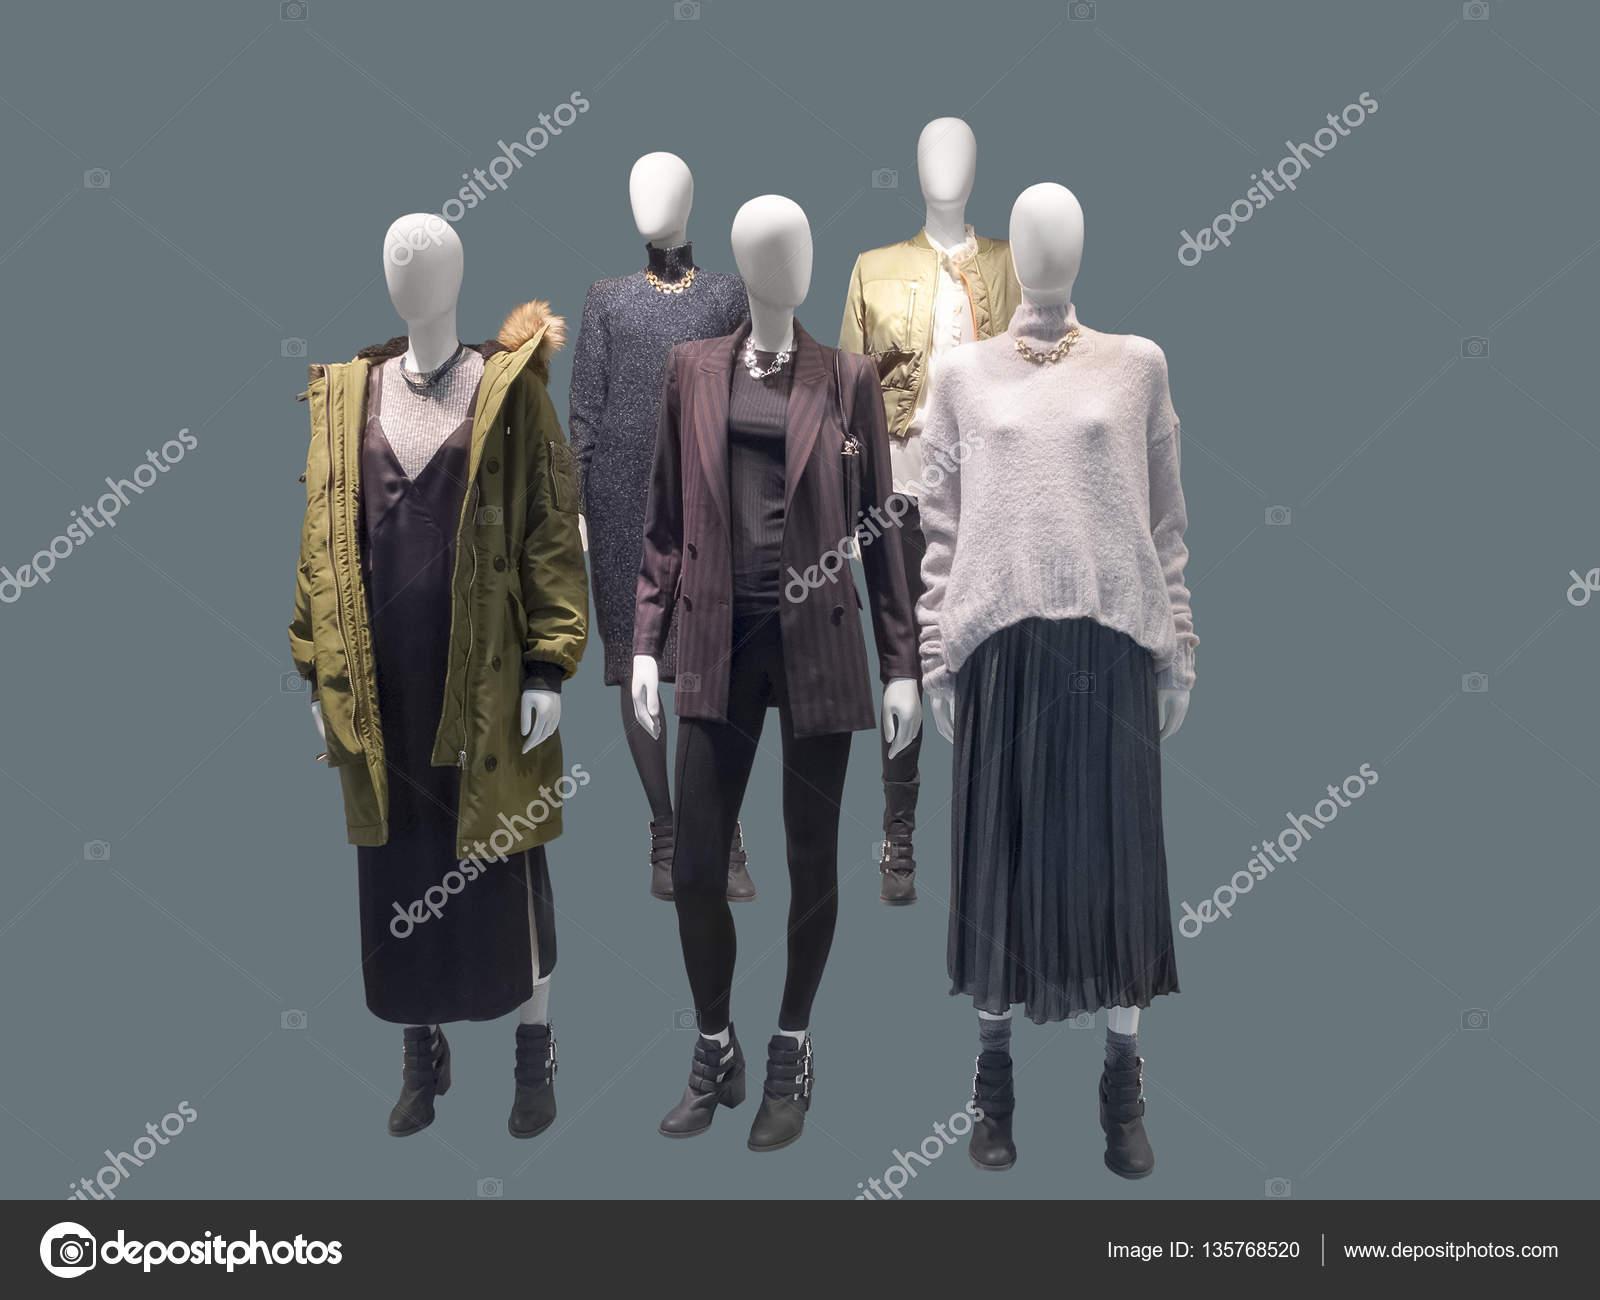 Група Манекени жіночі — Стокове фото — Група © modustollens  135768520 9aa42546fcb40